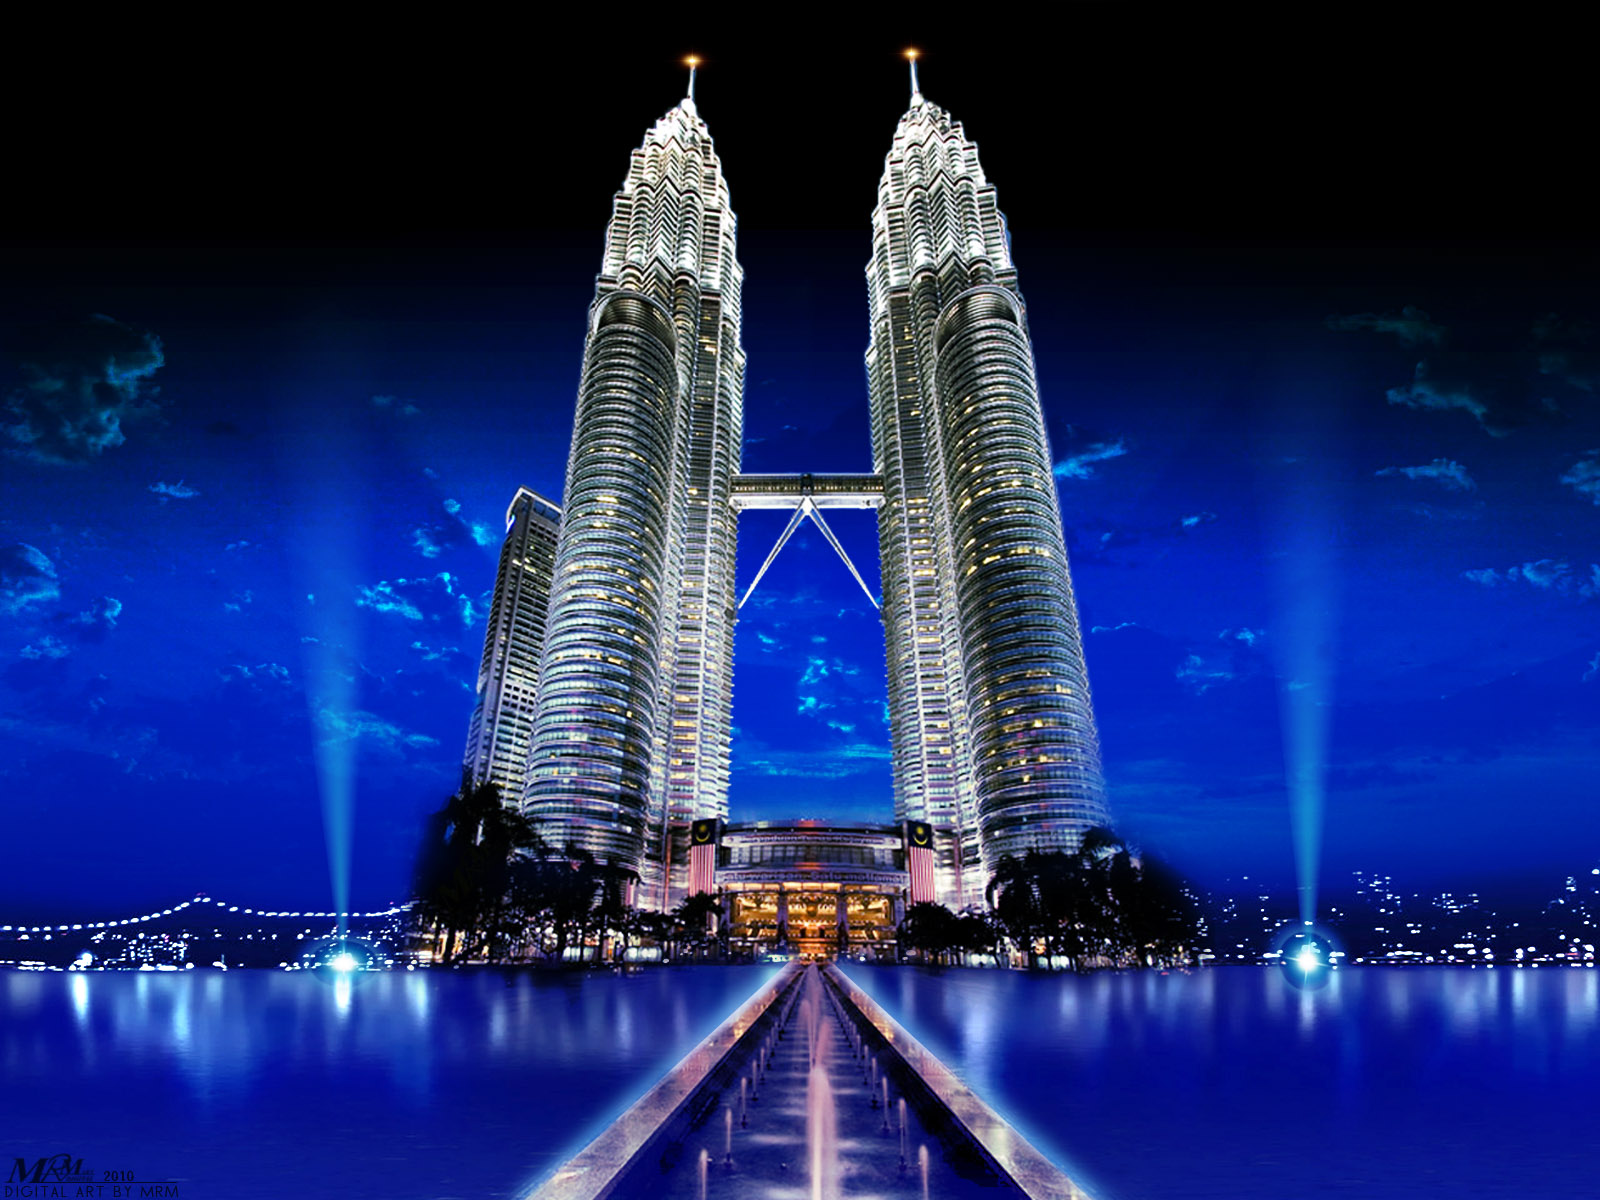 http://1.bp.blogspot.com/-ZqQVjsM_3ms/TfkS4zu-AsI/AAAAAAAAE5c/HDRDXgfNIO0/s1600/Wallpaper%2BPetronas%2BTwin%2BTowers%2BMalaysia-Psupero%2BManipulation%2BBy%2BMrm.jpg